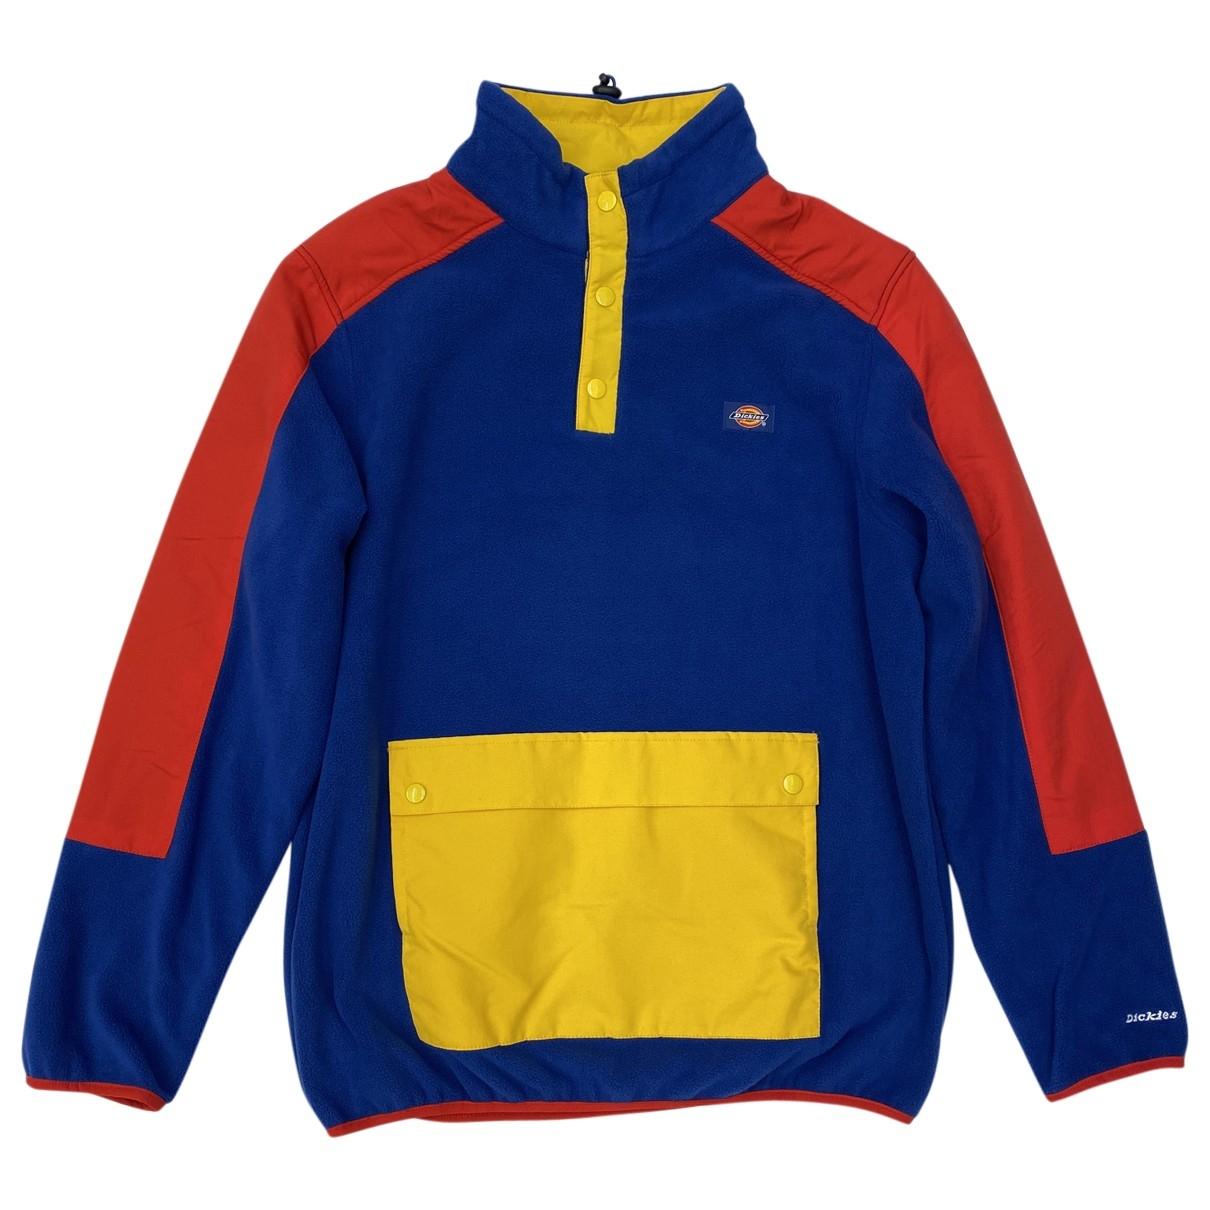 Dickies \N Multicolour Knitwear & Sweatshirts for Men L International